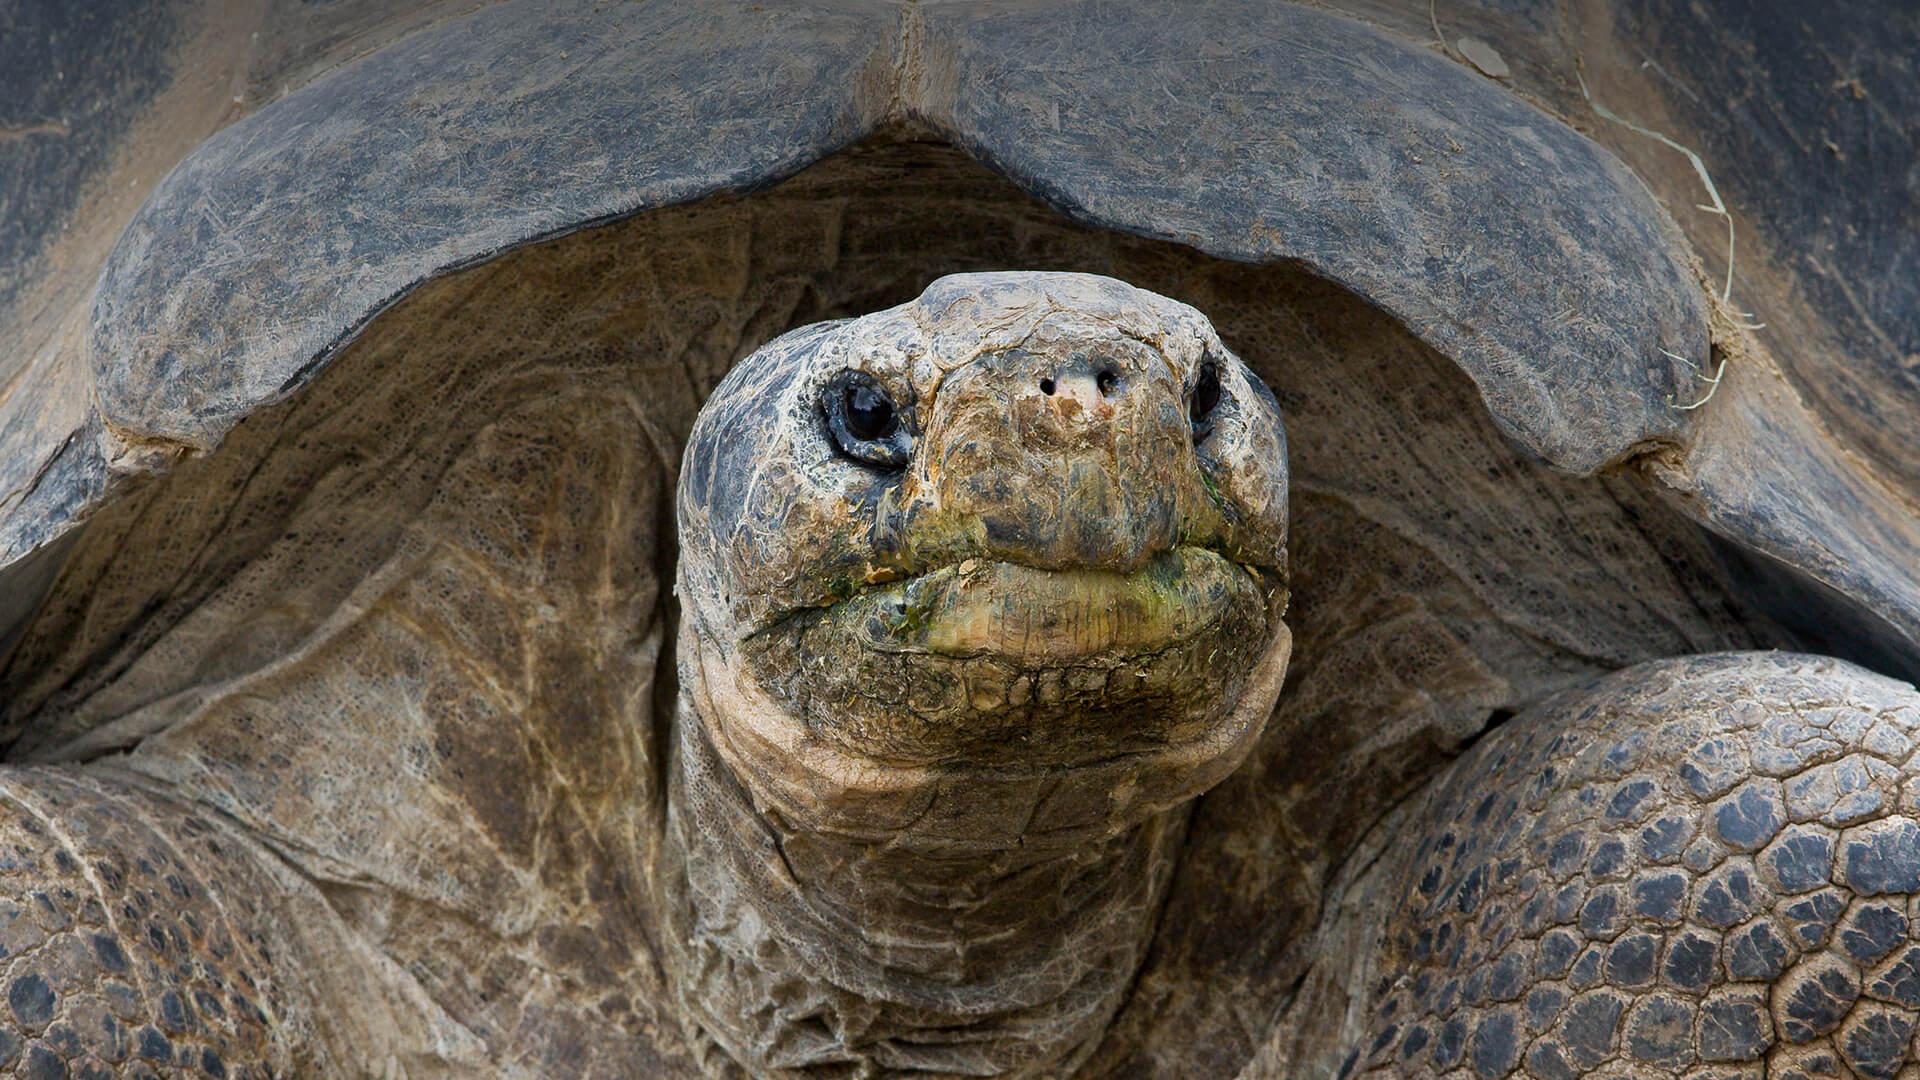 Tortue des îles Galápagos